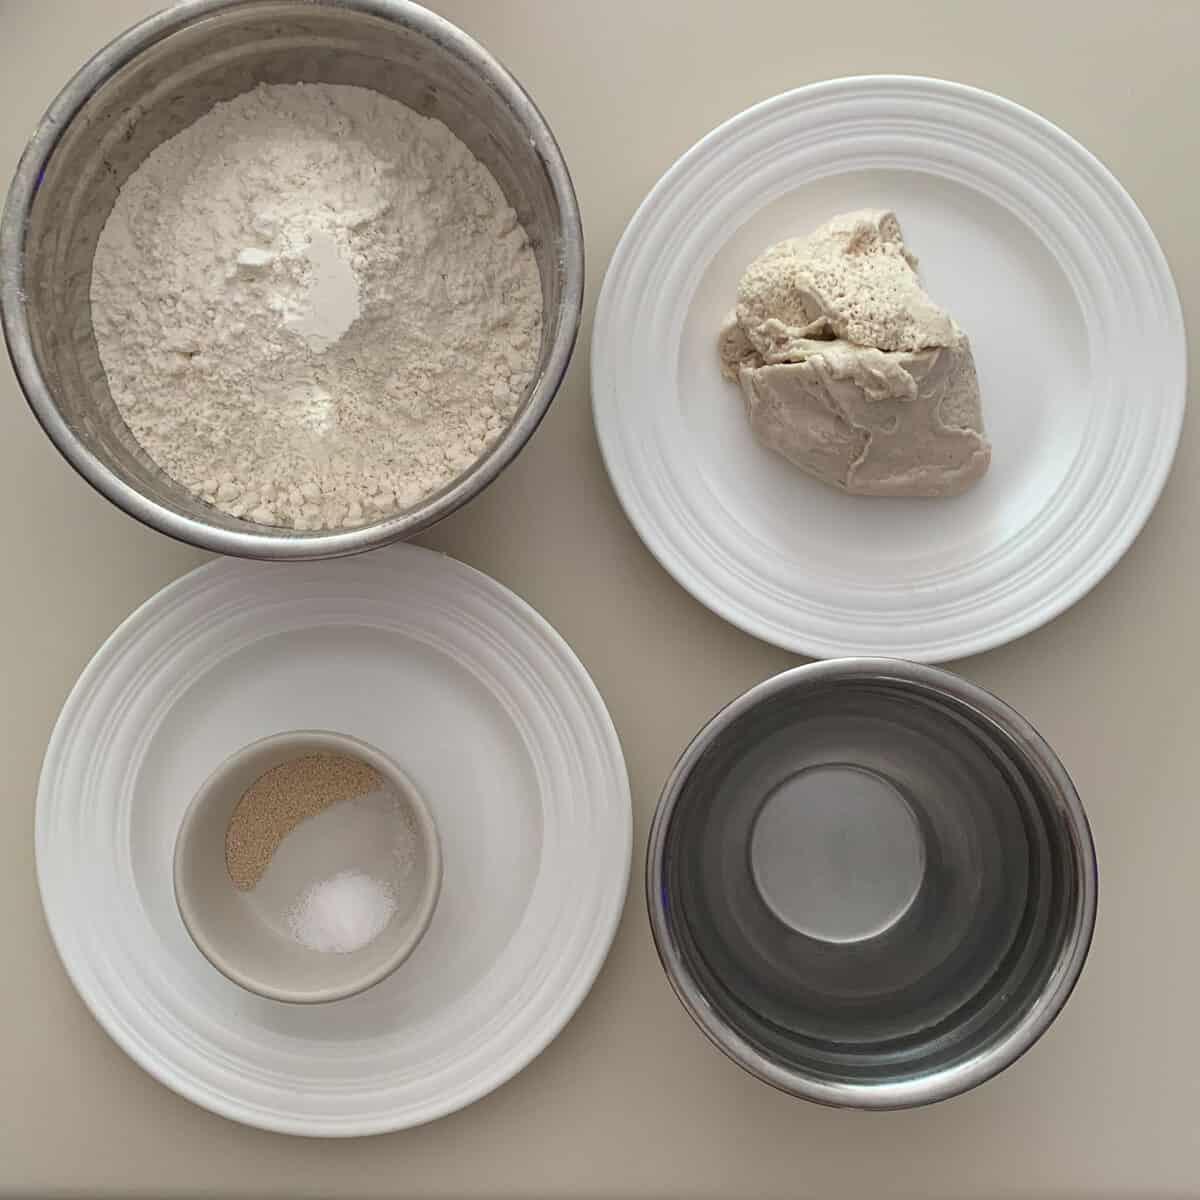 Bialys dough ingredients shown in bowls